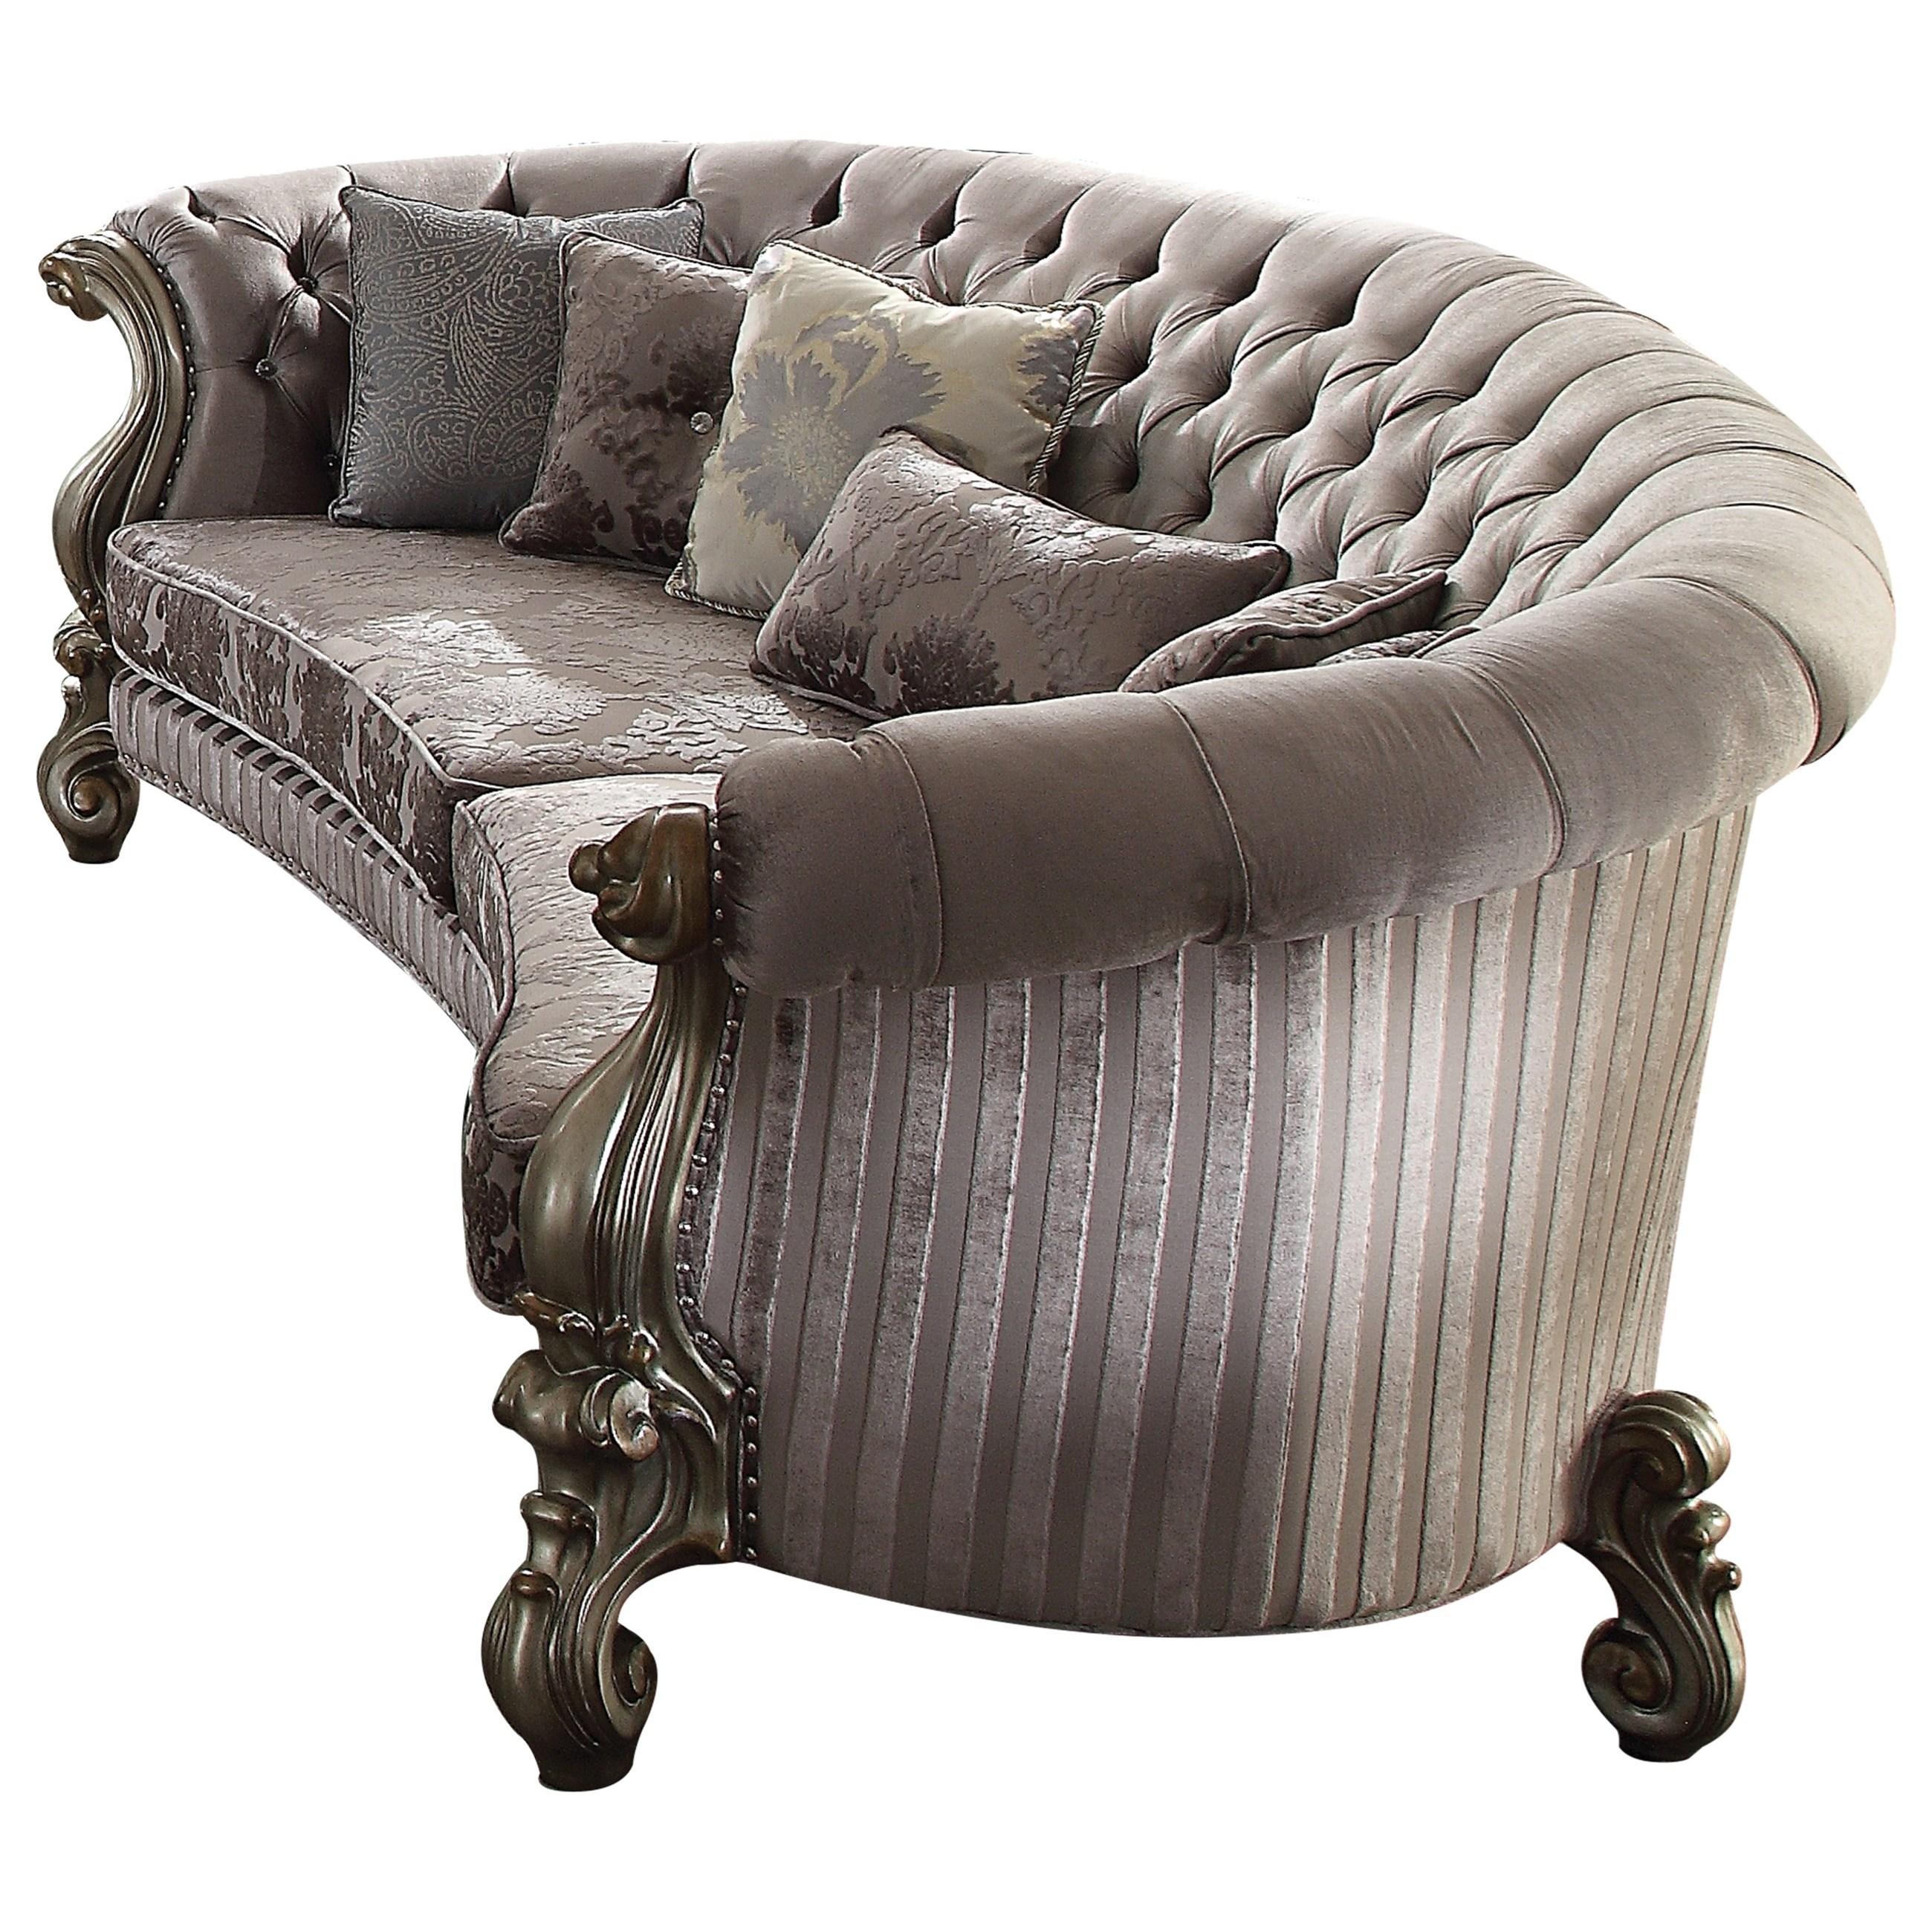 Versailles Sofa w/5 Pillows by Acme Furniture at Dream Home Interiors